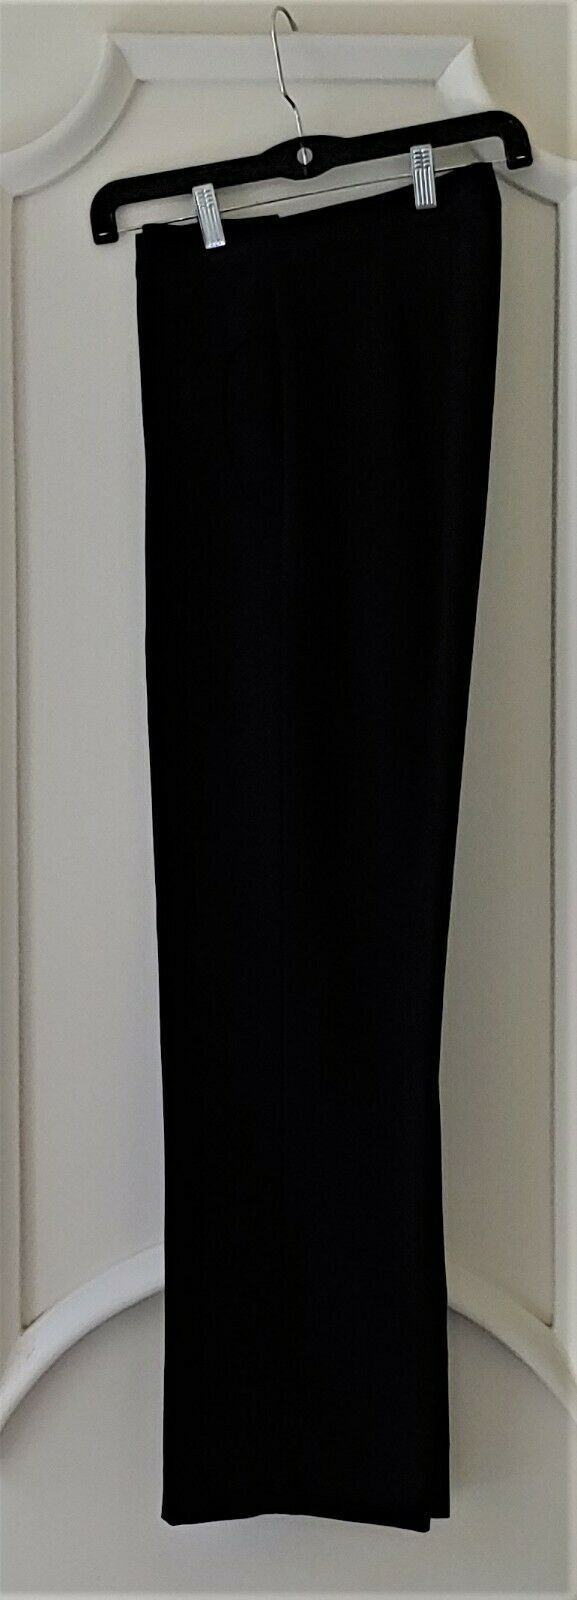 Stylish Women's Golf & Casual Tan Short Sleeve Collar Top, Swarovski Buttons  image 8